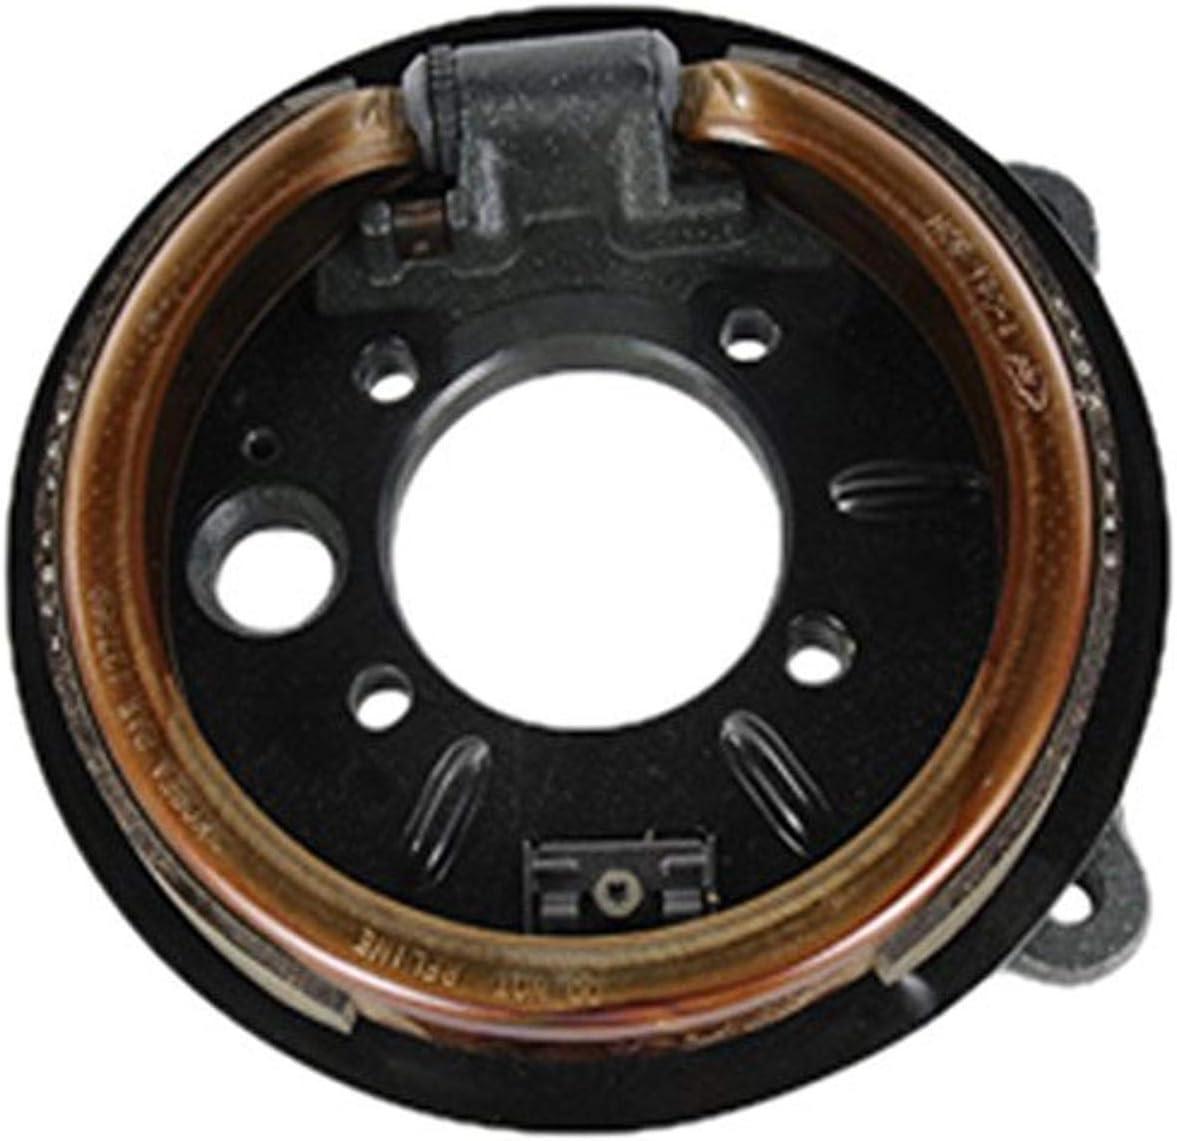 NOS OEM Delco//GM Rear Radio Mounting Bracket Part# 22542885 91-94 Chevy Cavalier